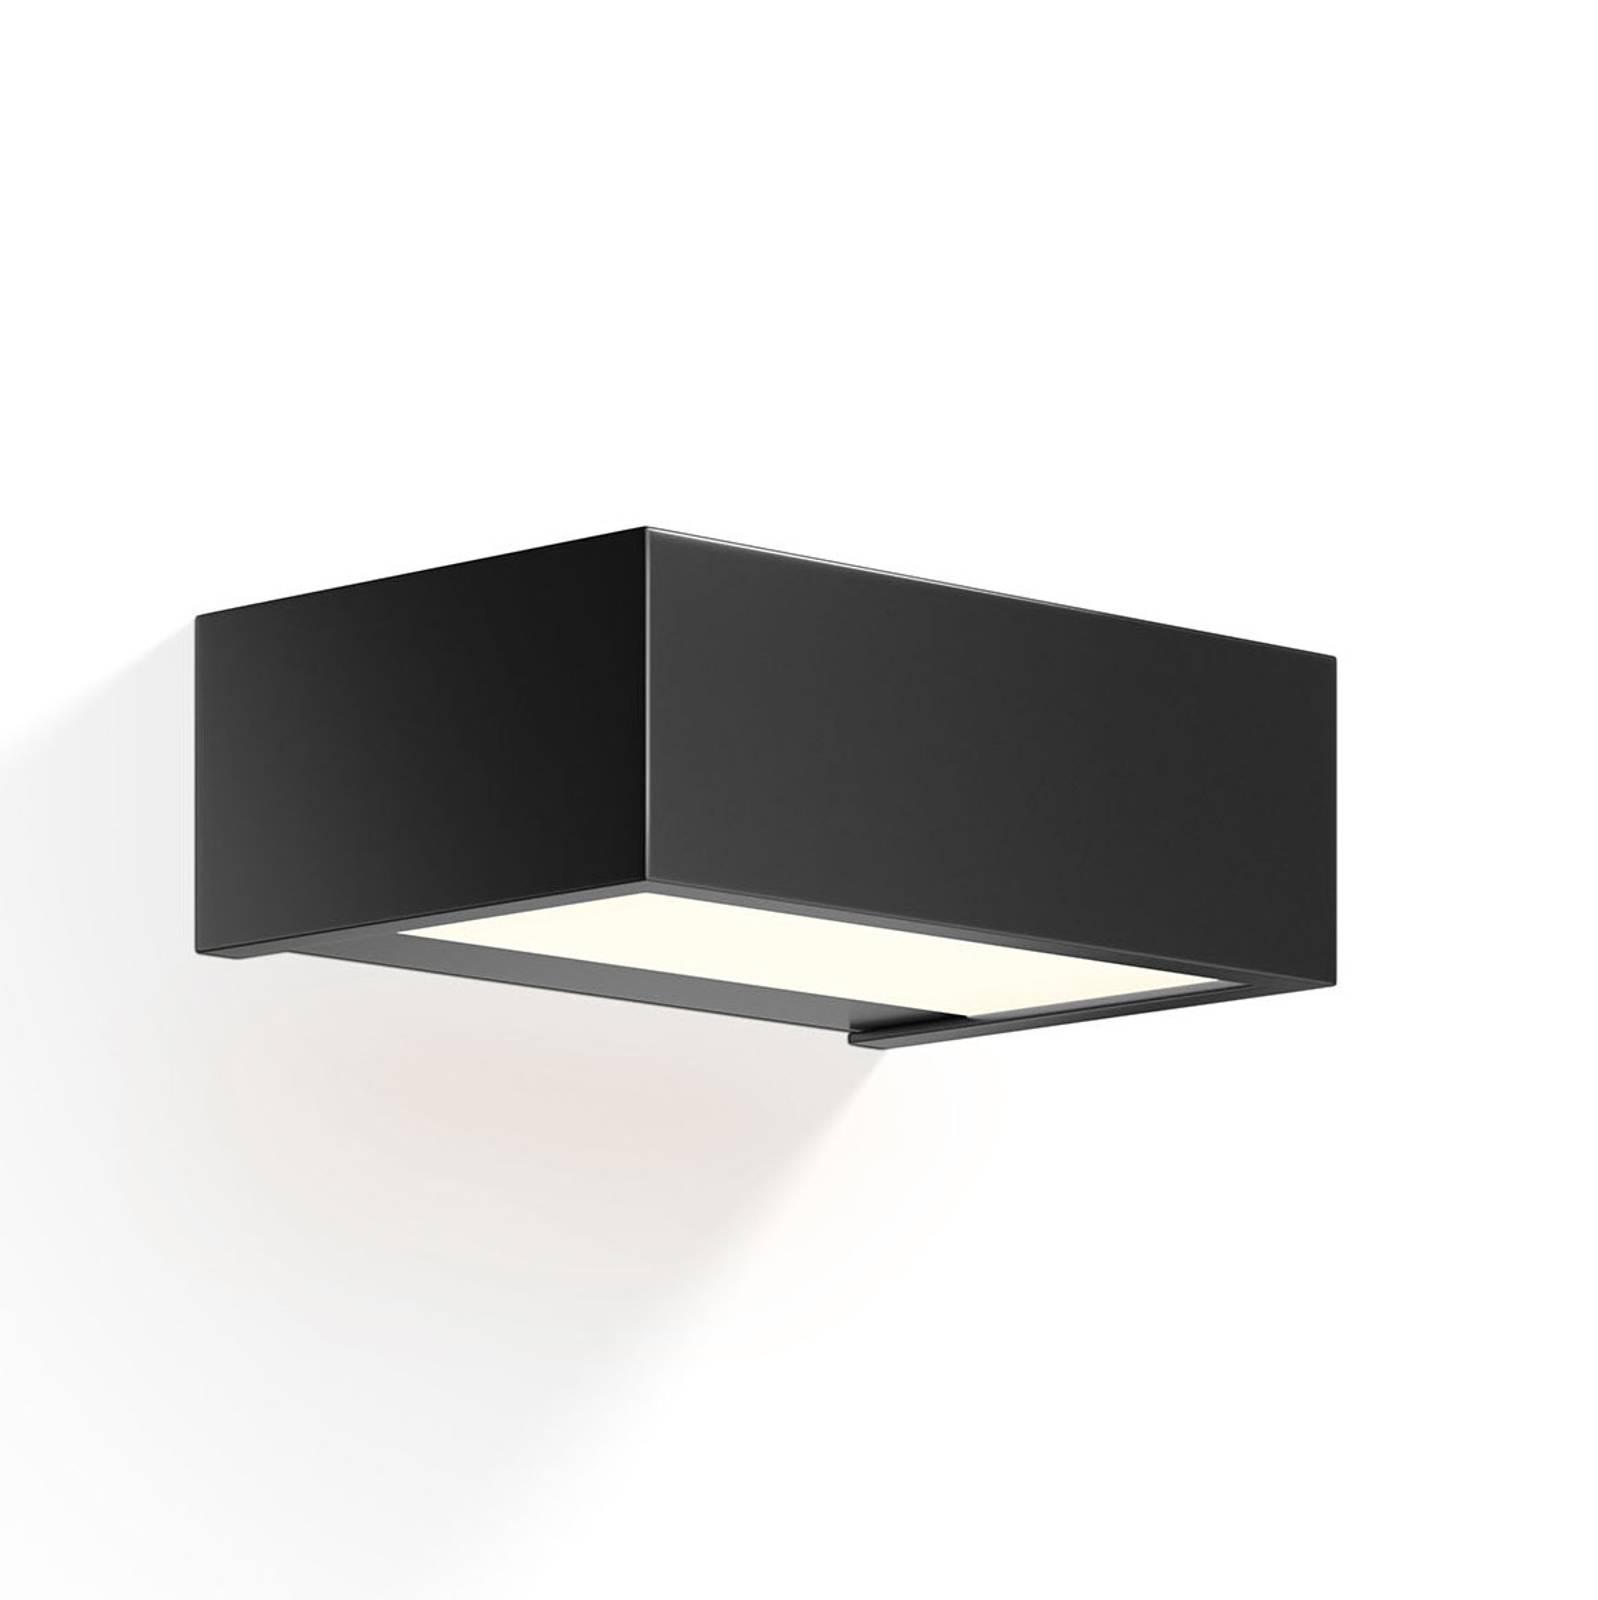 Decor Walther Box LED-valaisin musta 2700K 15cm